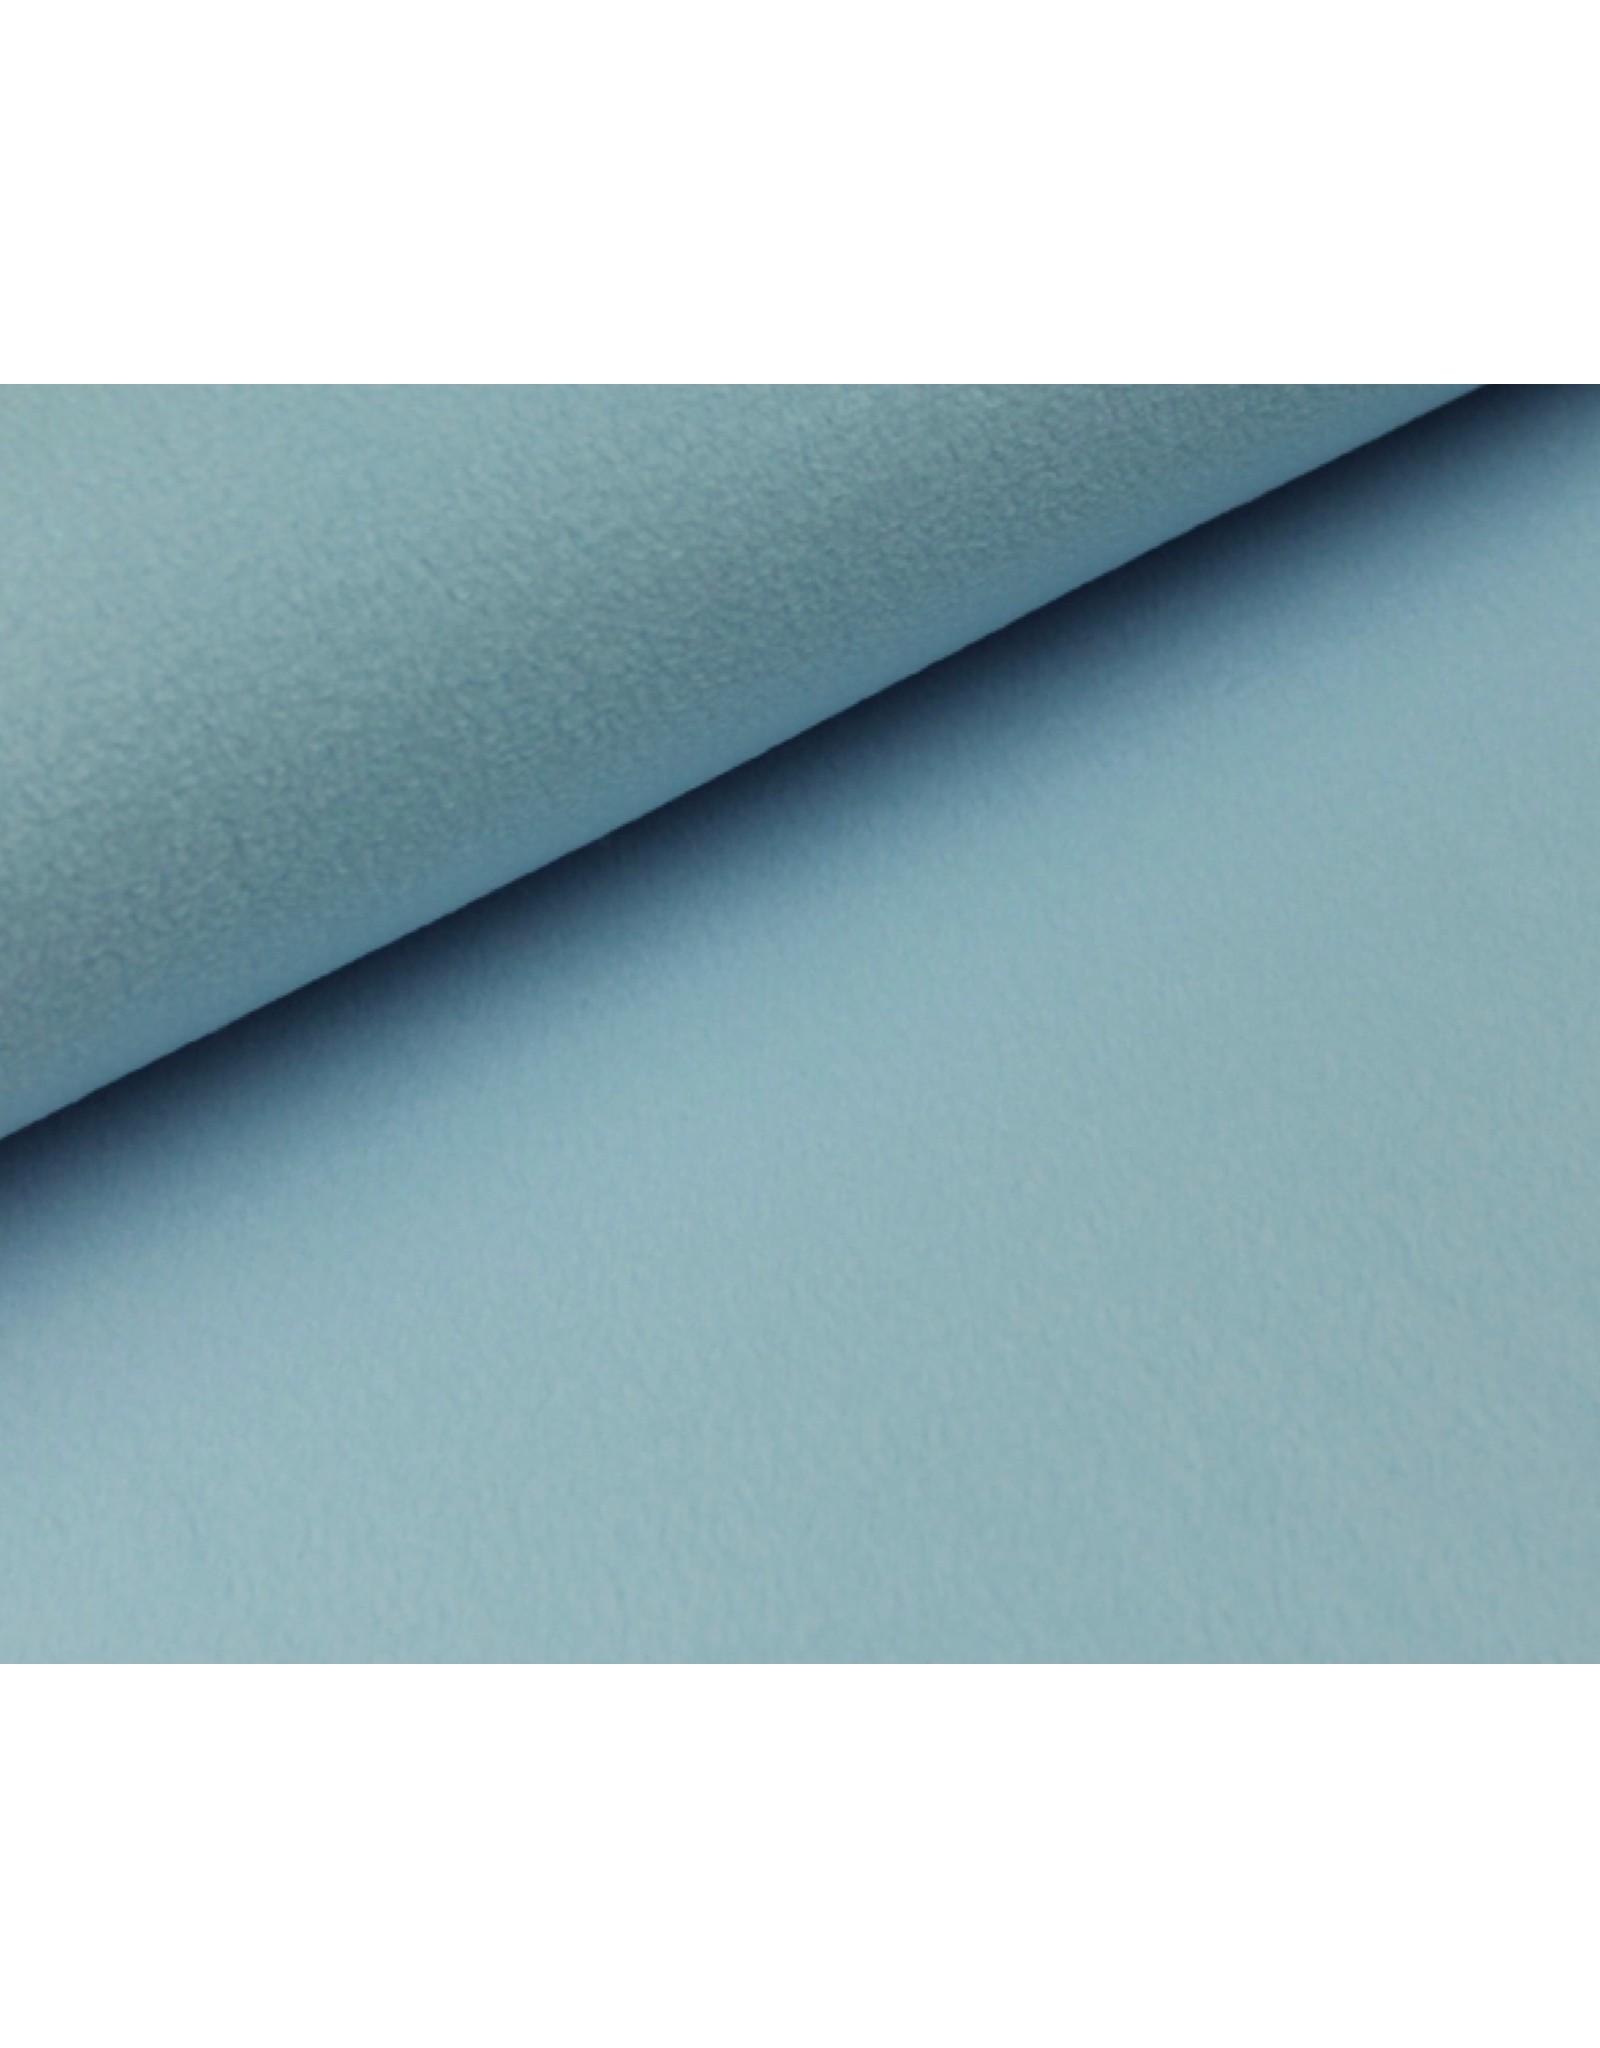 Polar Fleece stoff Eisblau